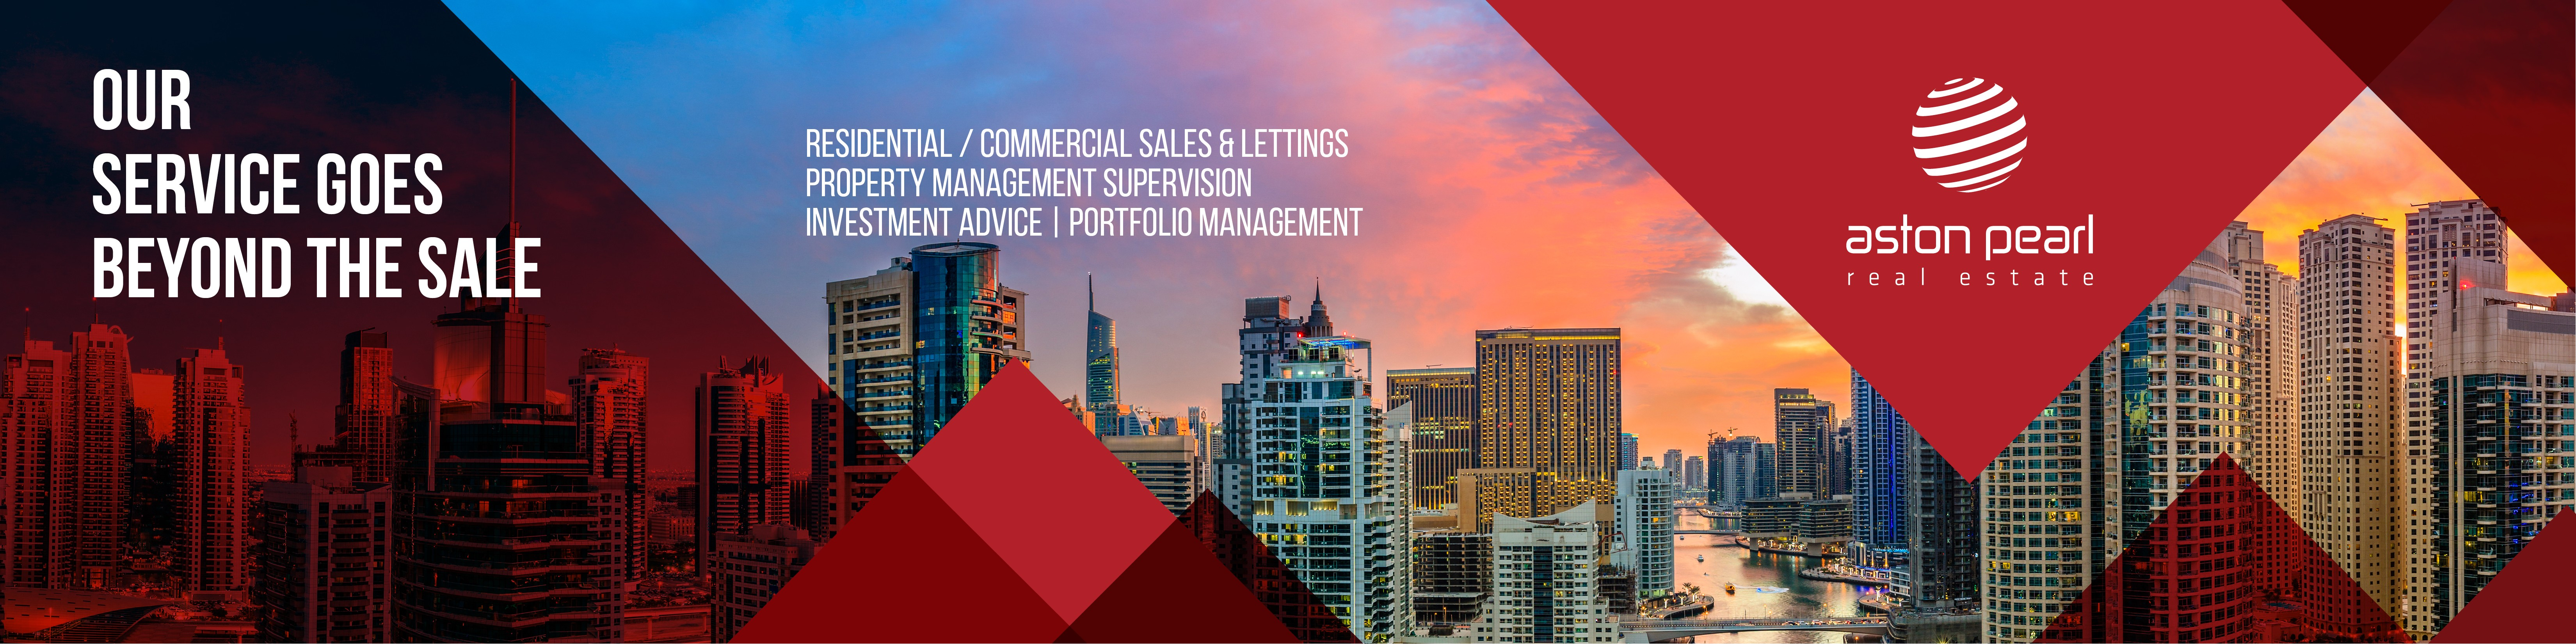 Aston Pearl Real Estate Broker | LinkedIn